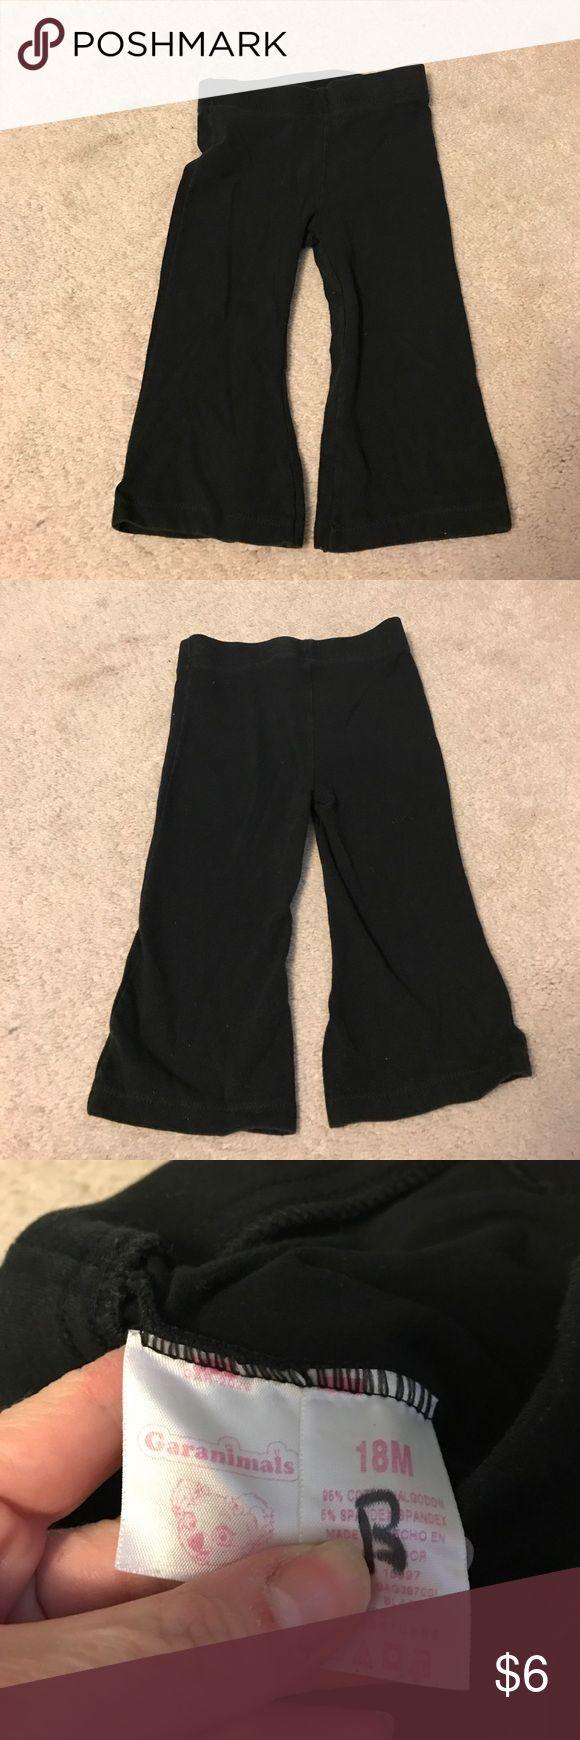 Garanimals girls black leggings size 18M Garanimals girls black leggings size 18 months. Excellent gently used condition no rips, stains or tears! garanimals Bottoms Leggings